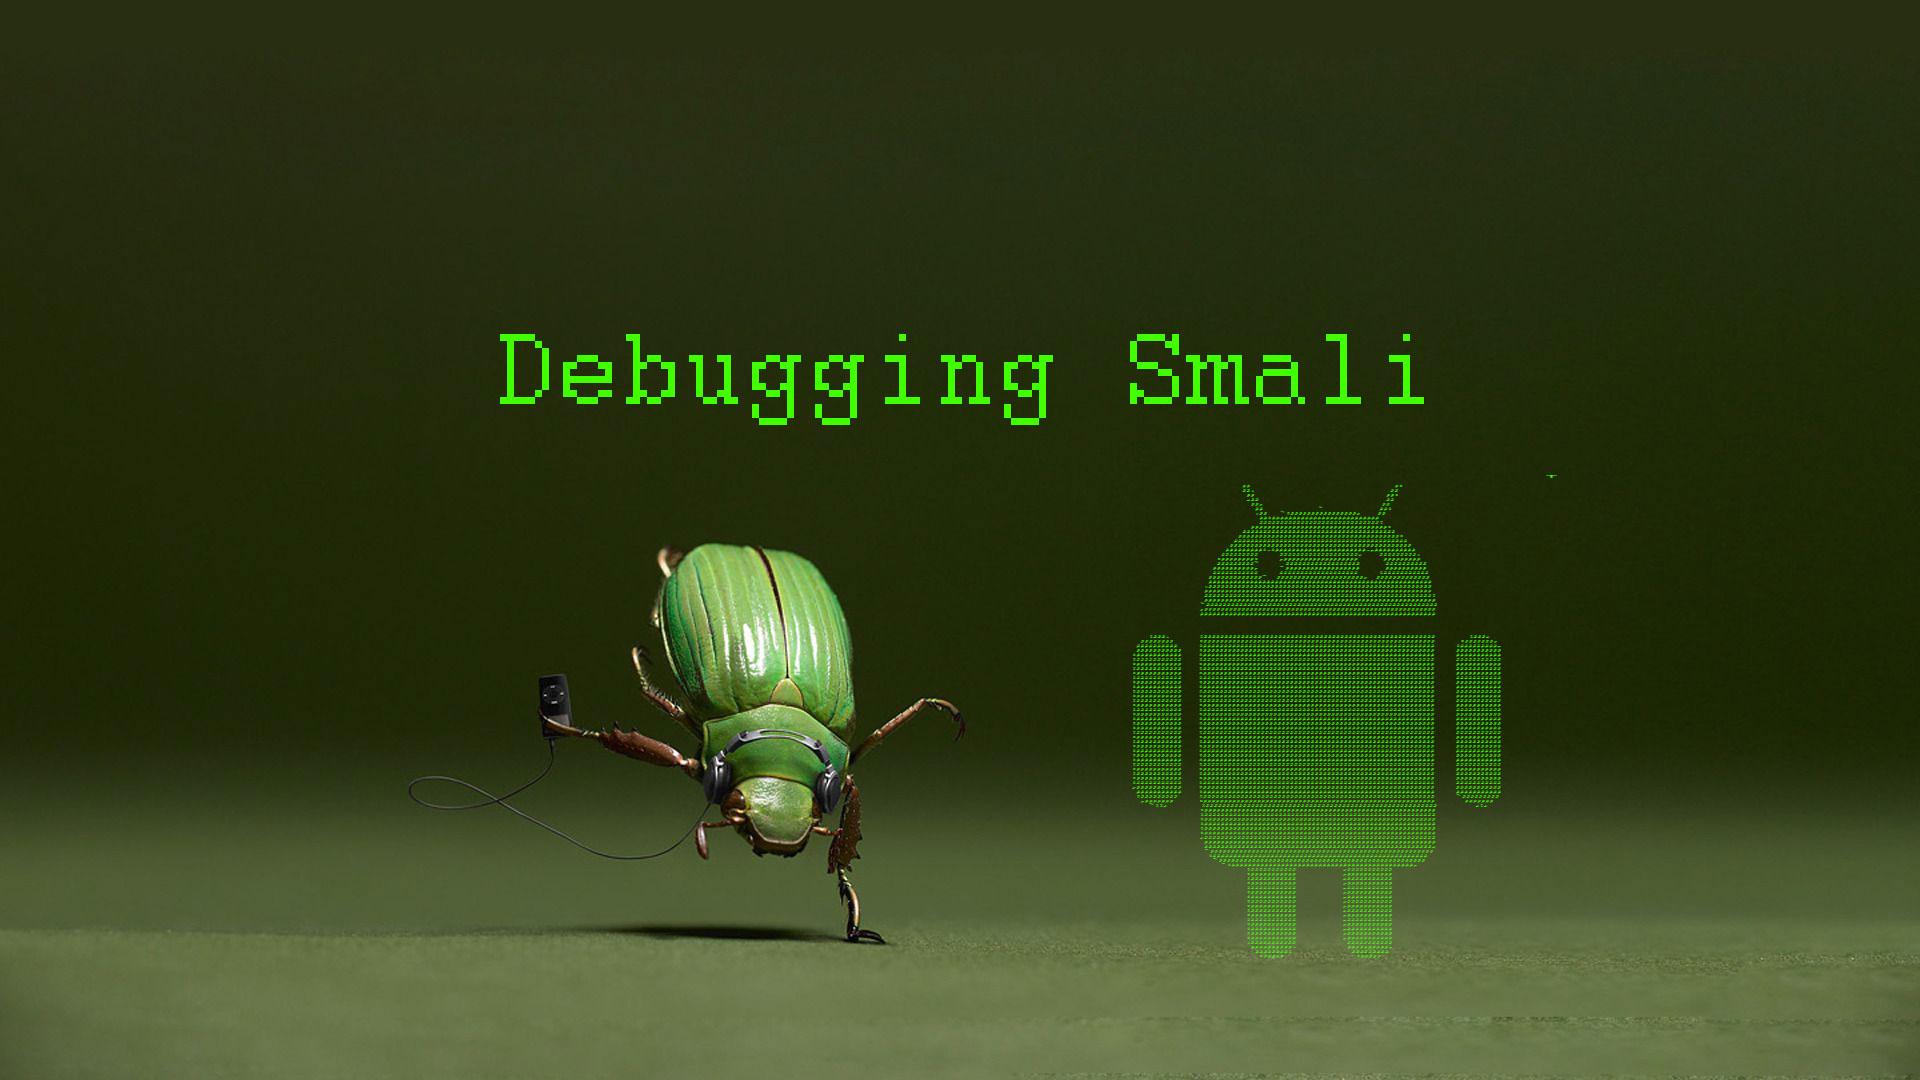 Android Reverse Engineering: Debugging Smali in Smalidea